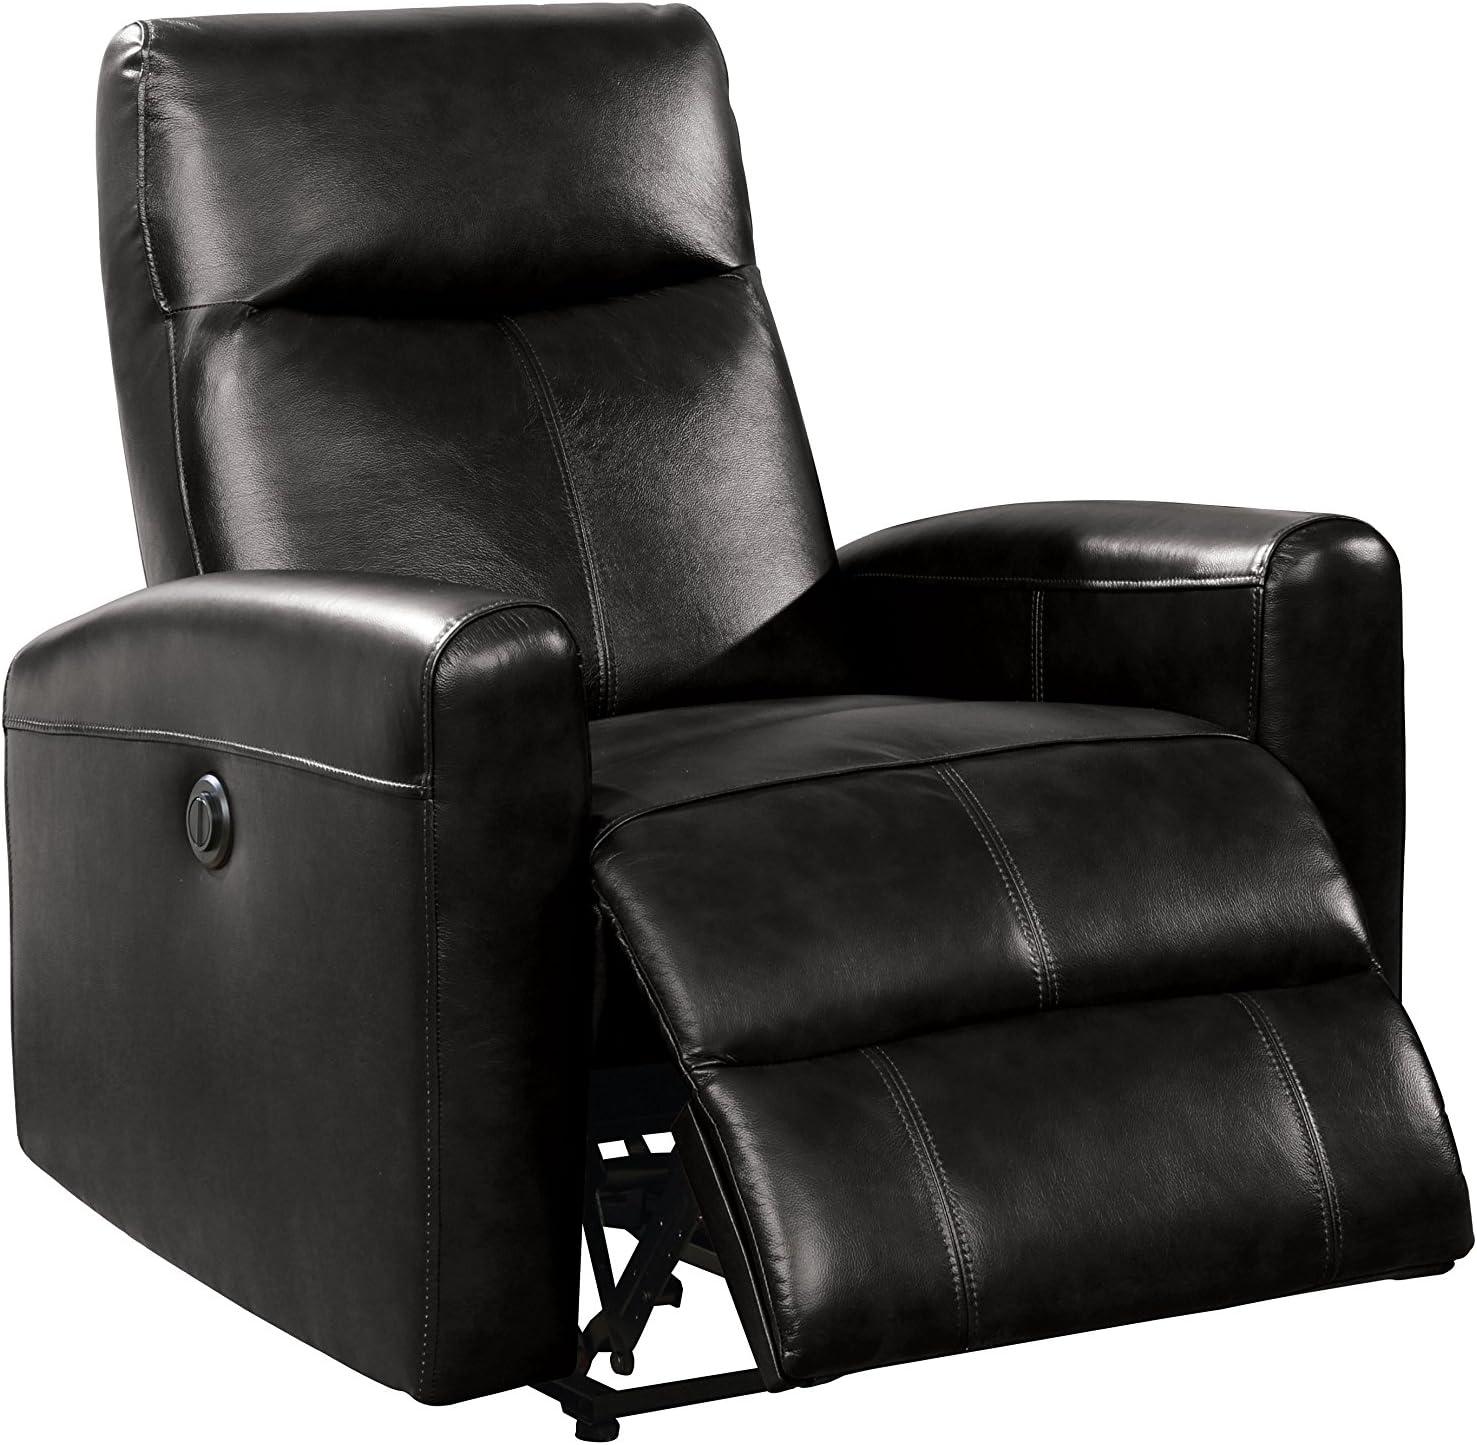 ACME Furniture 59686 Blane Power Recliner, Black Leather